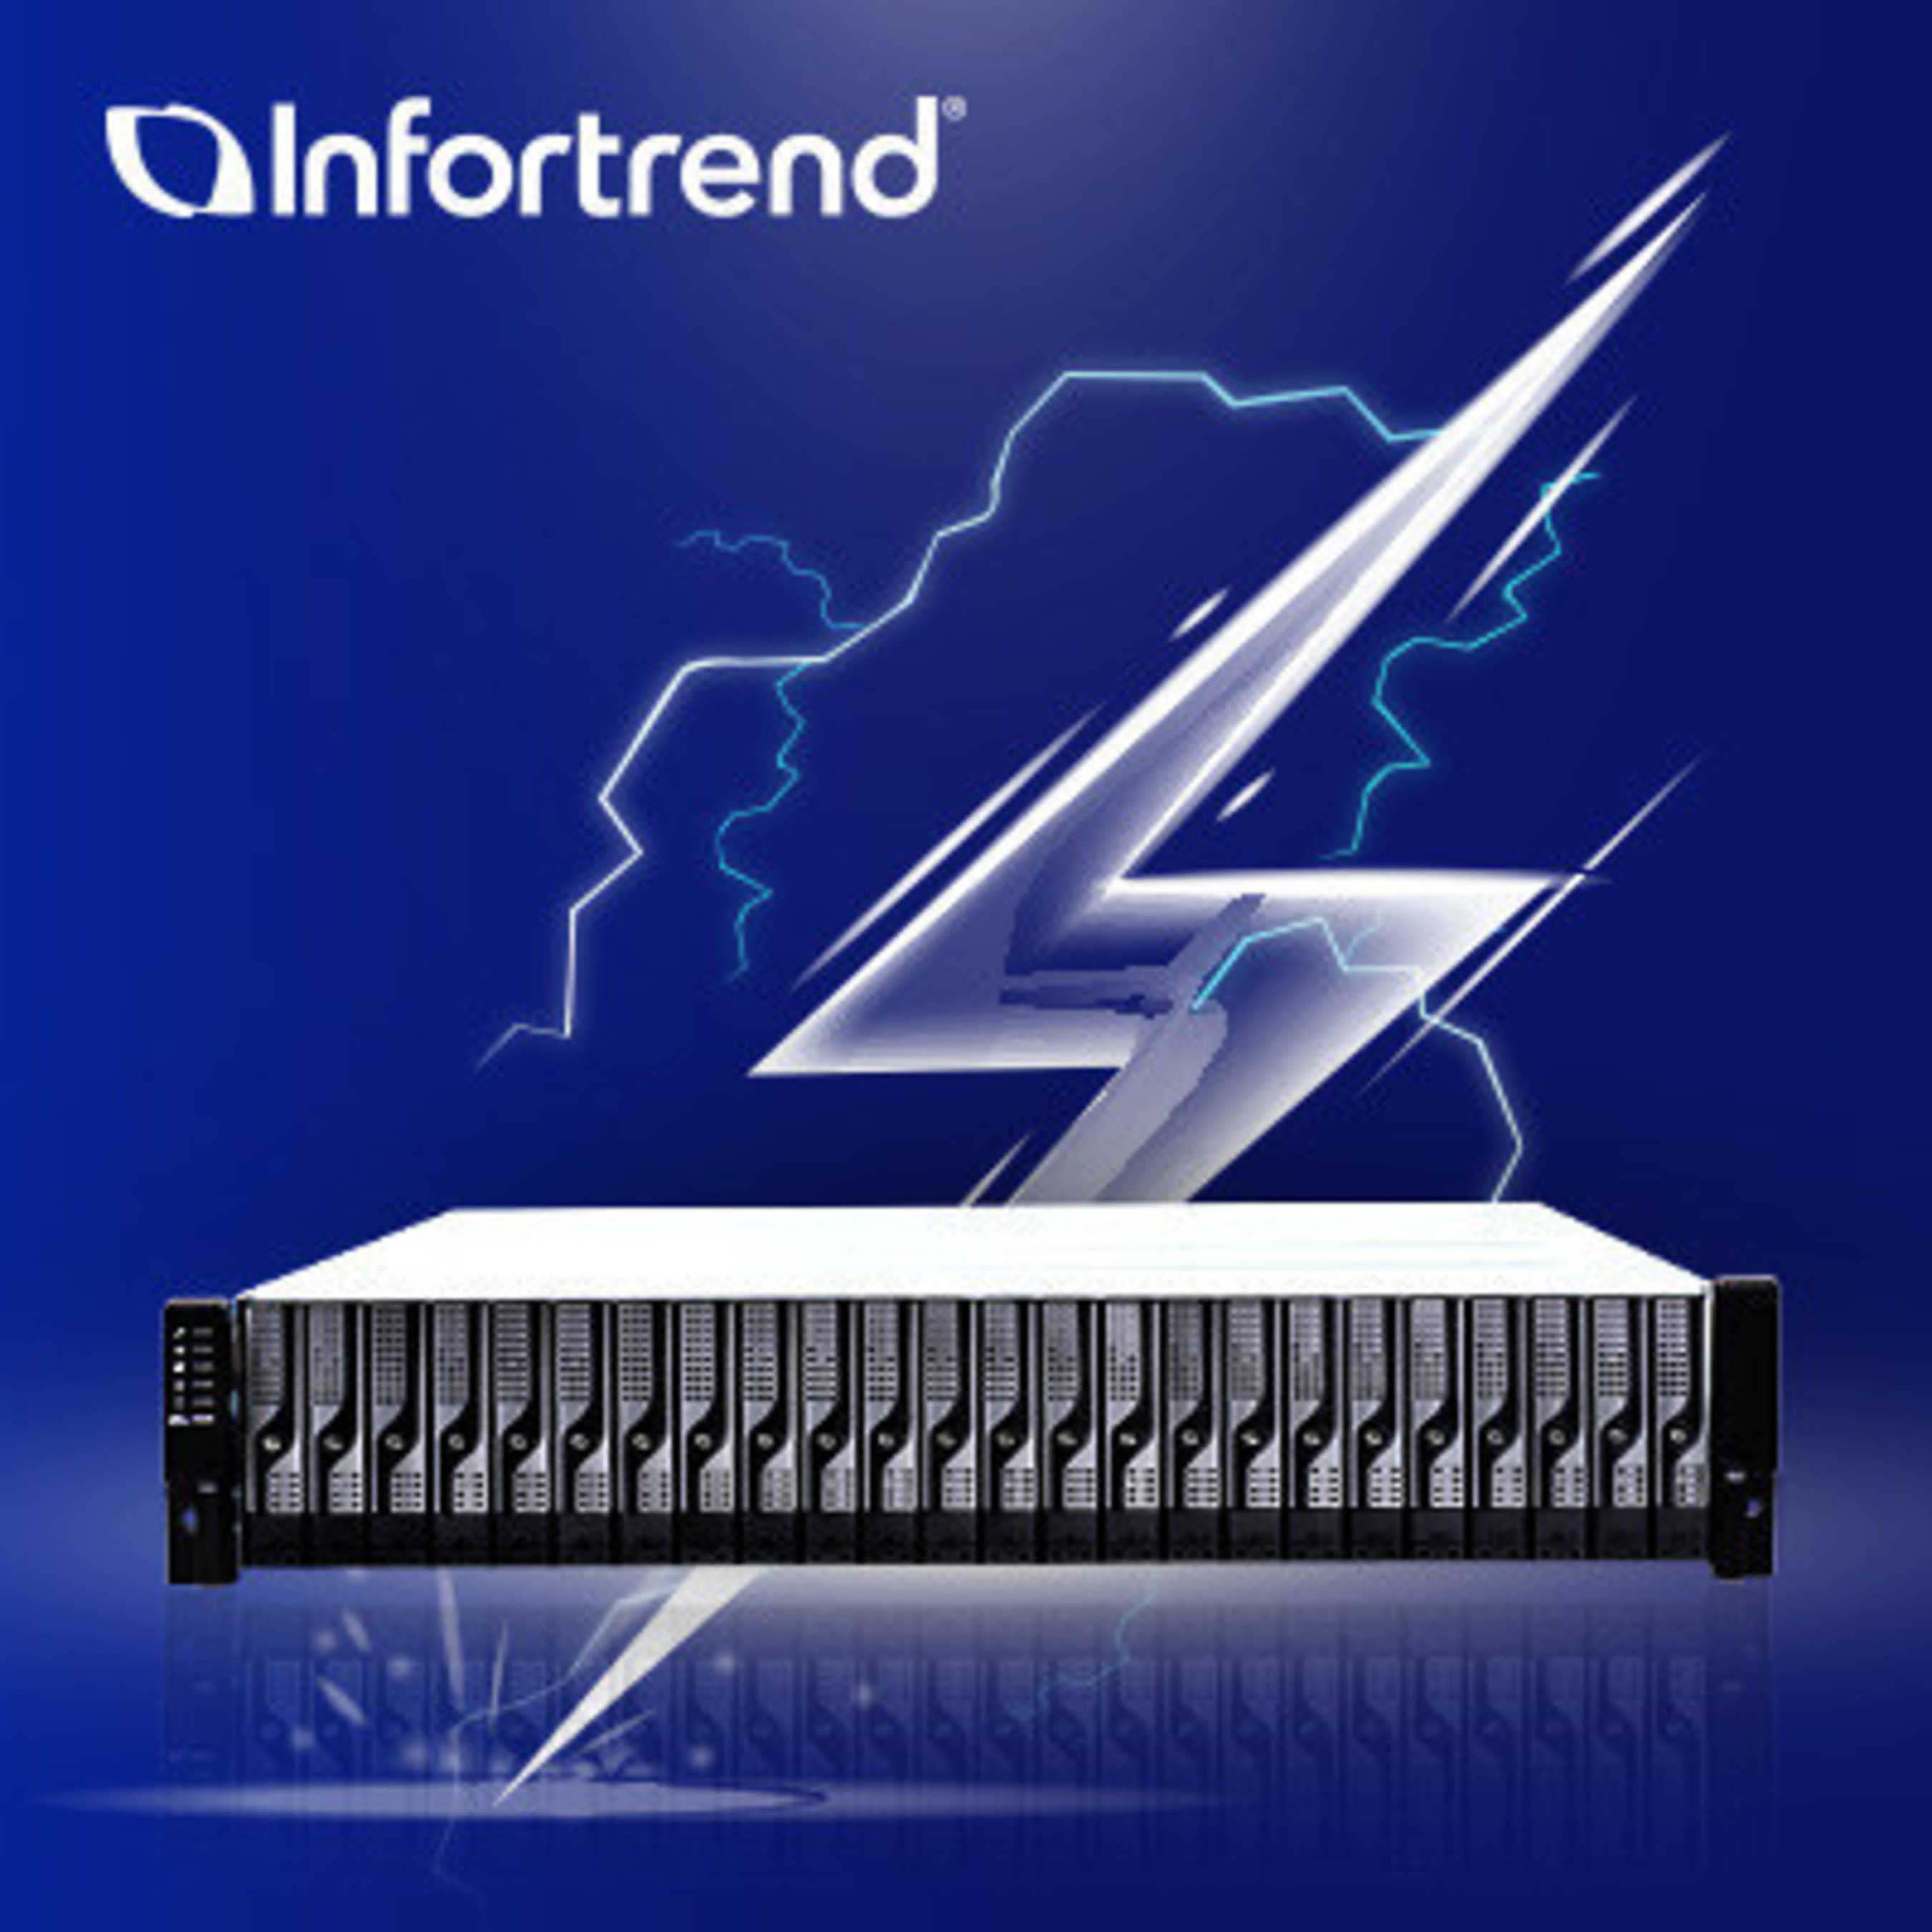 Infortrend Announces Ultra High Performance 'EonStor DS 4000 Gen2'